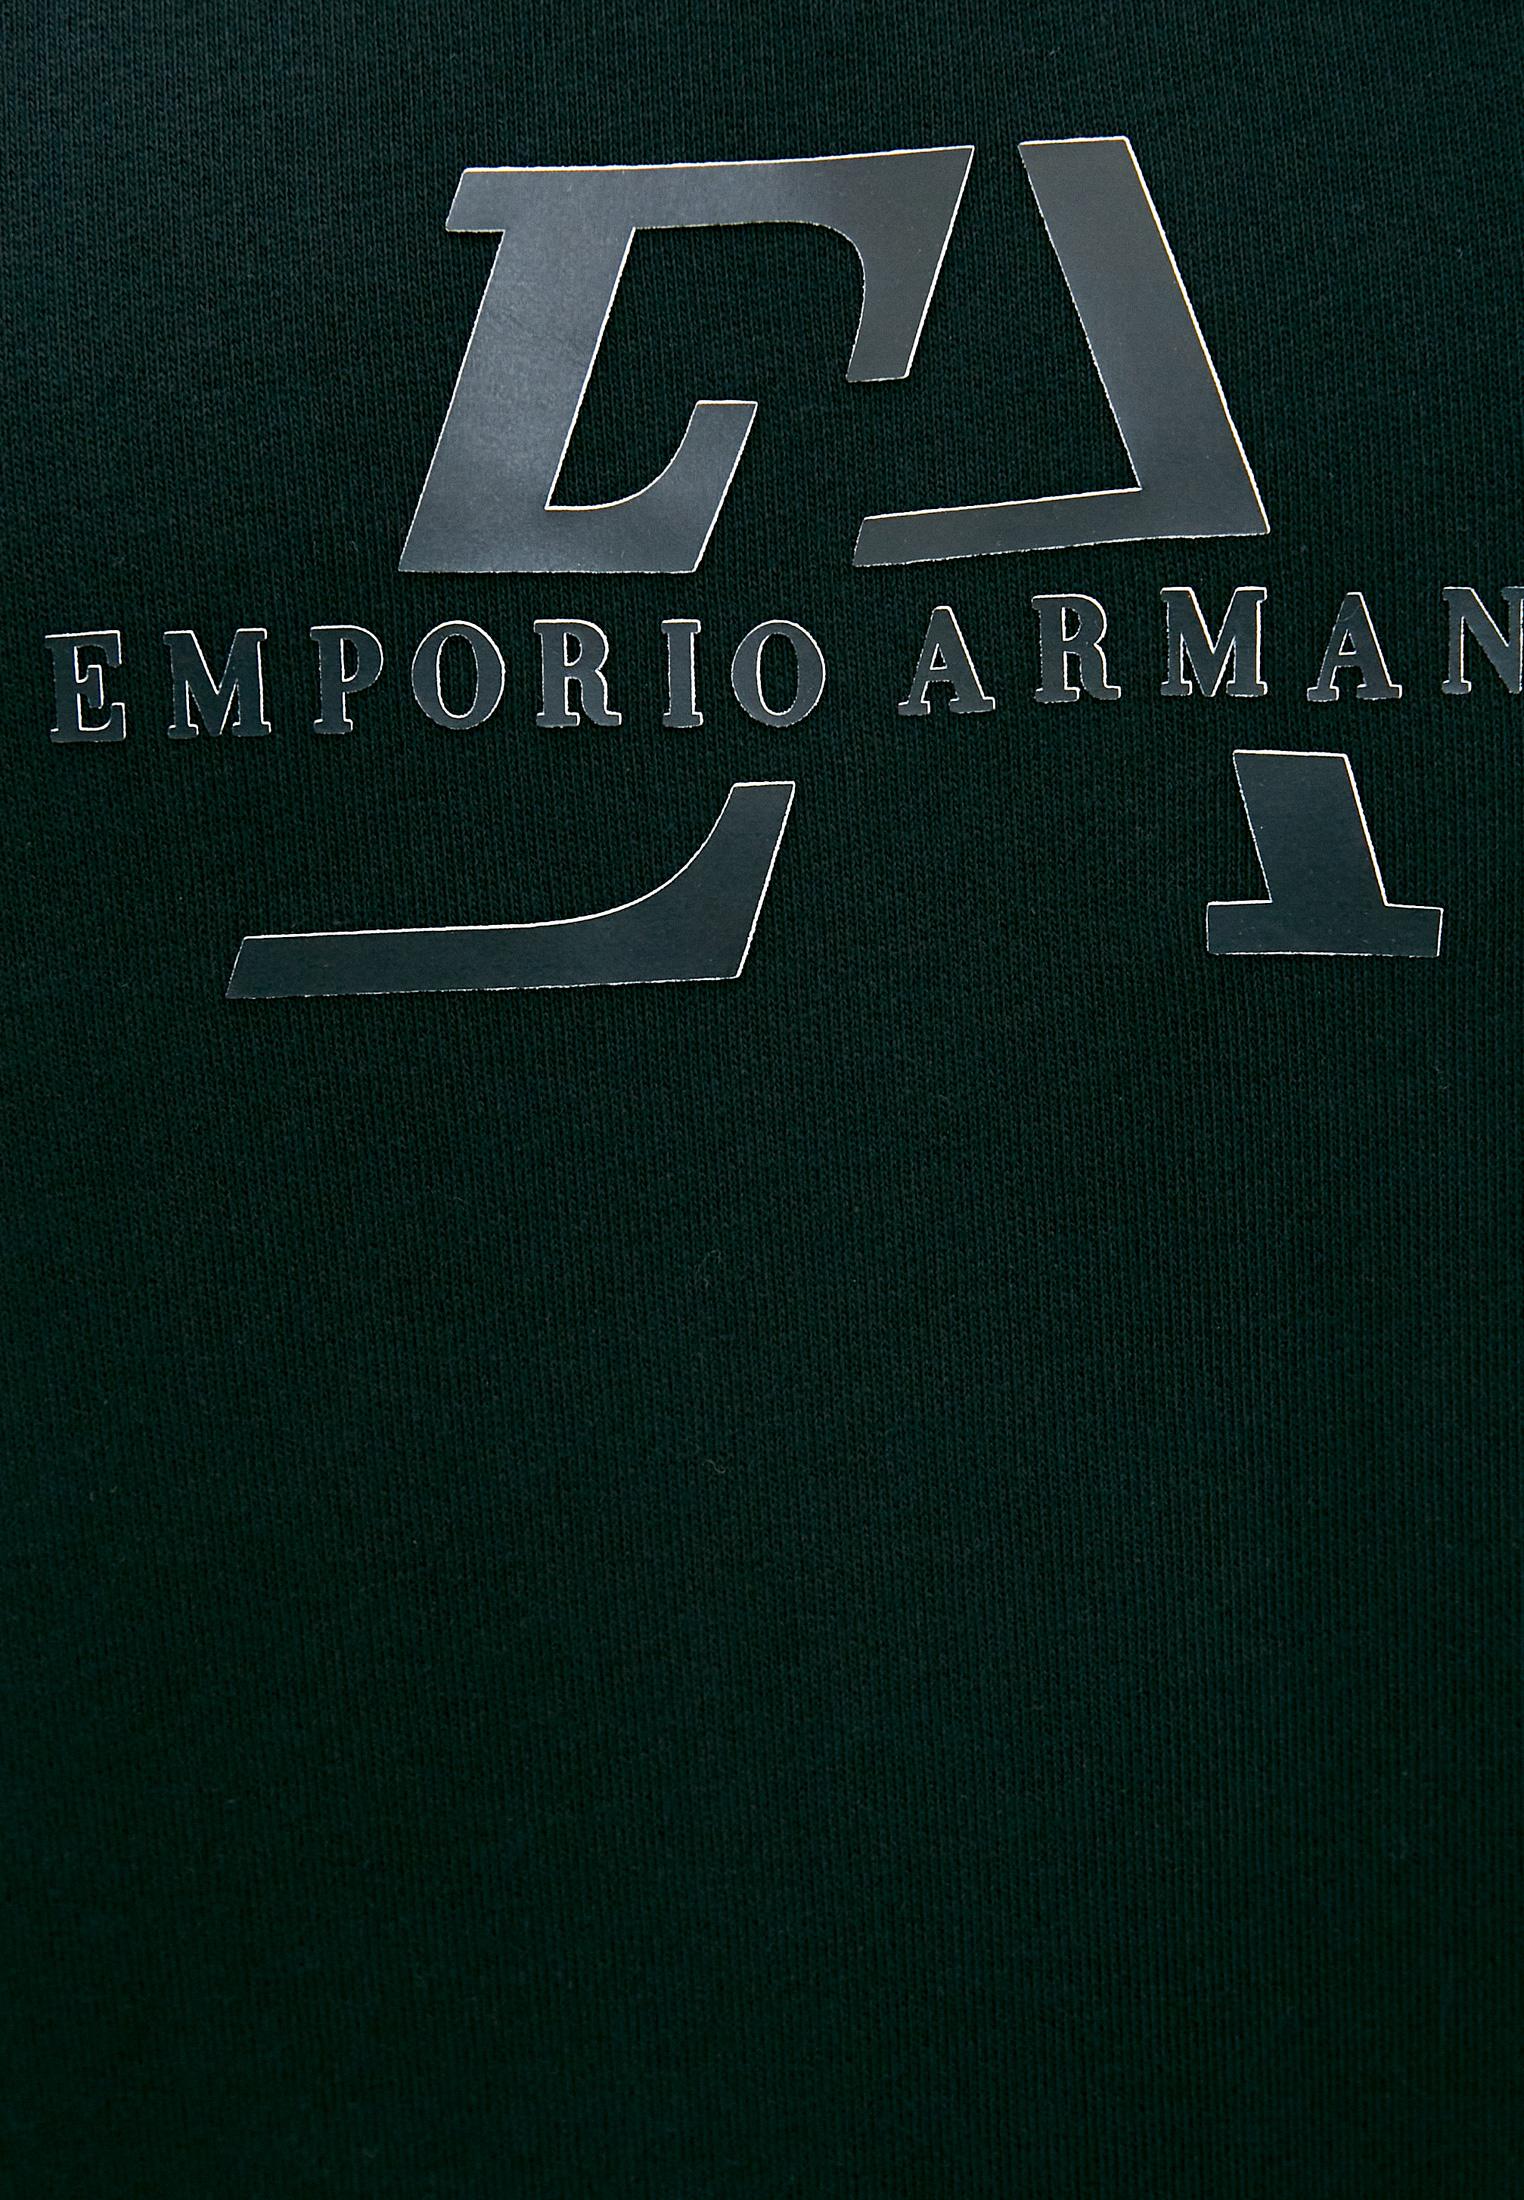 Свитер Emporio Armani 3K1MD61JTNZ: изображение 5